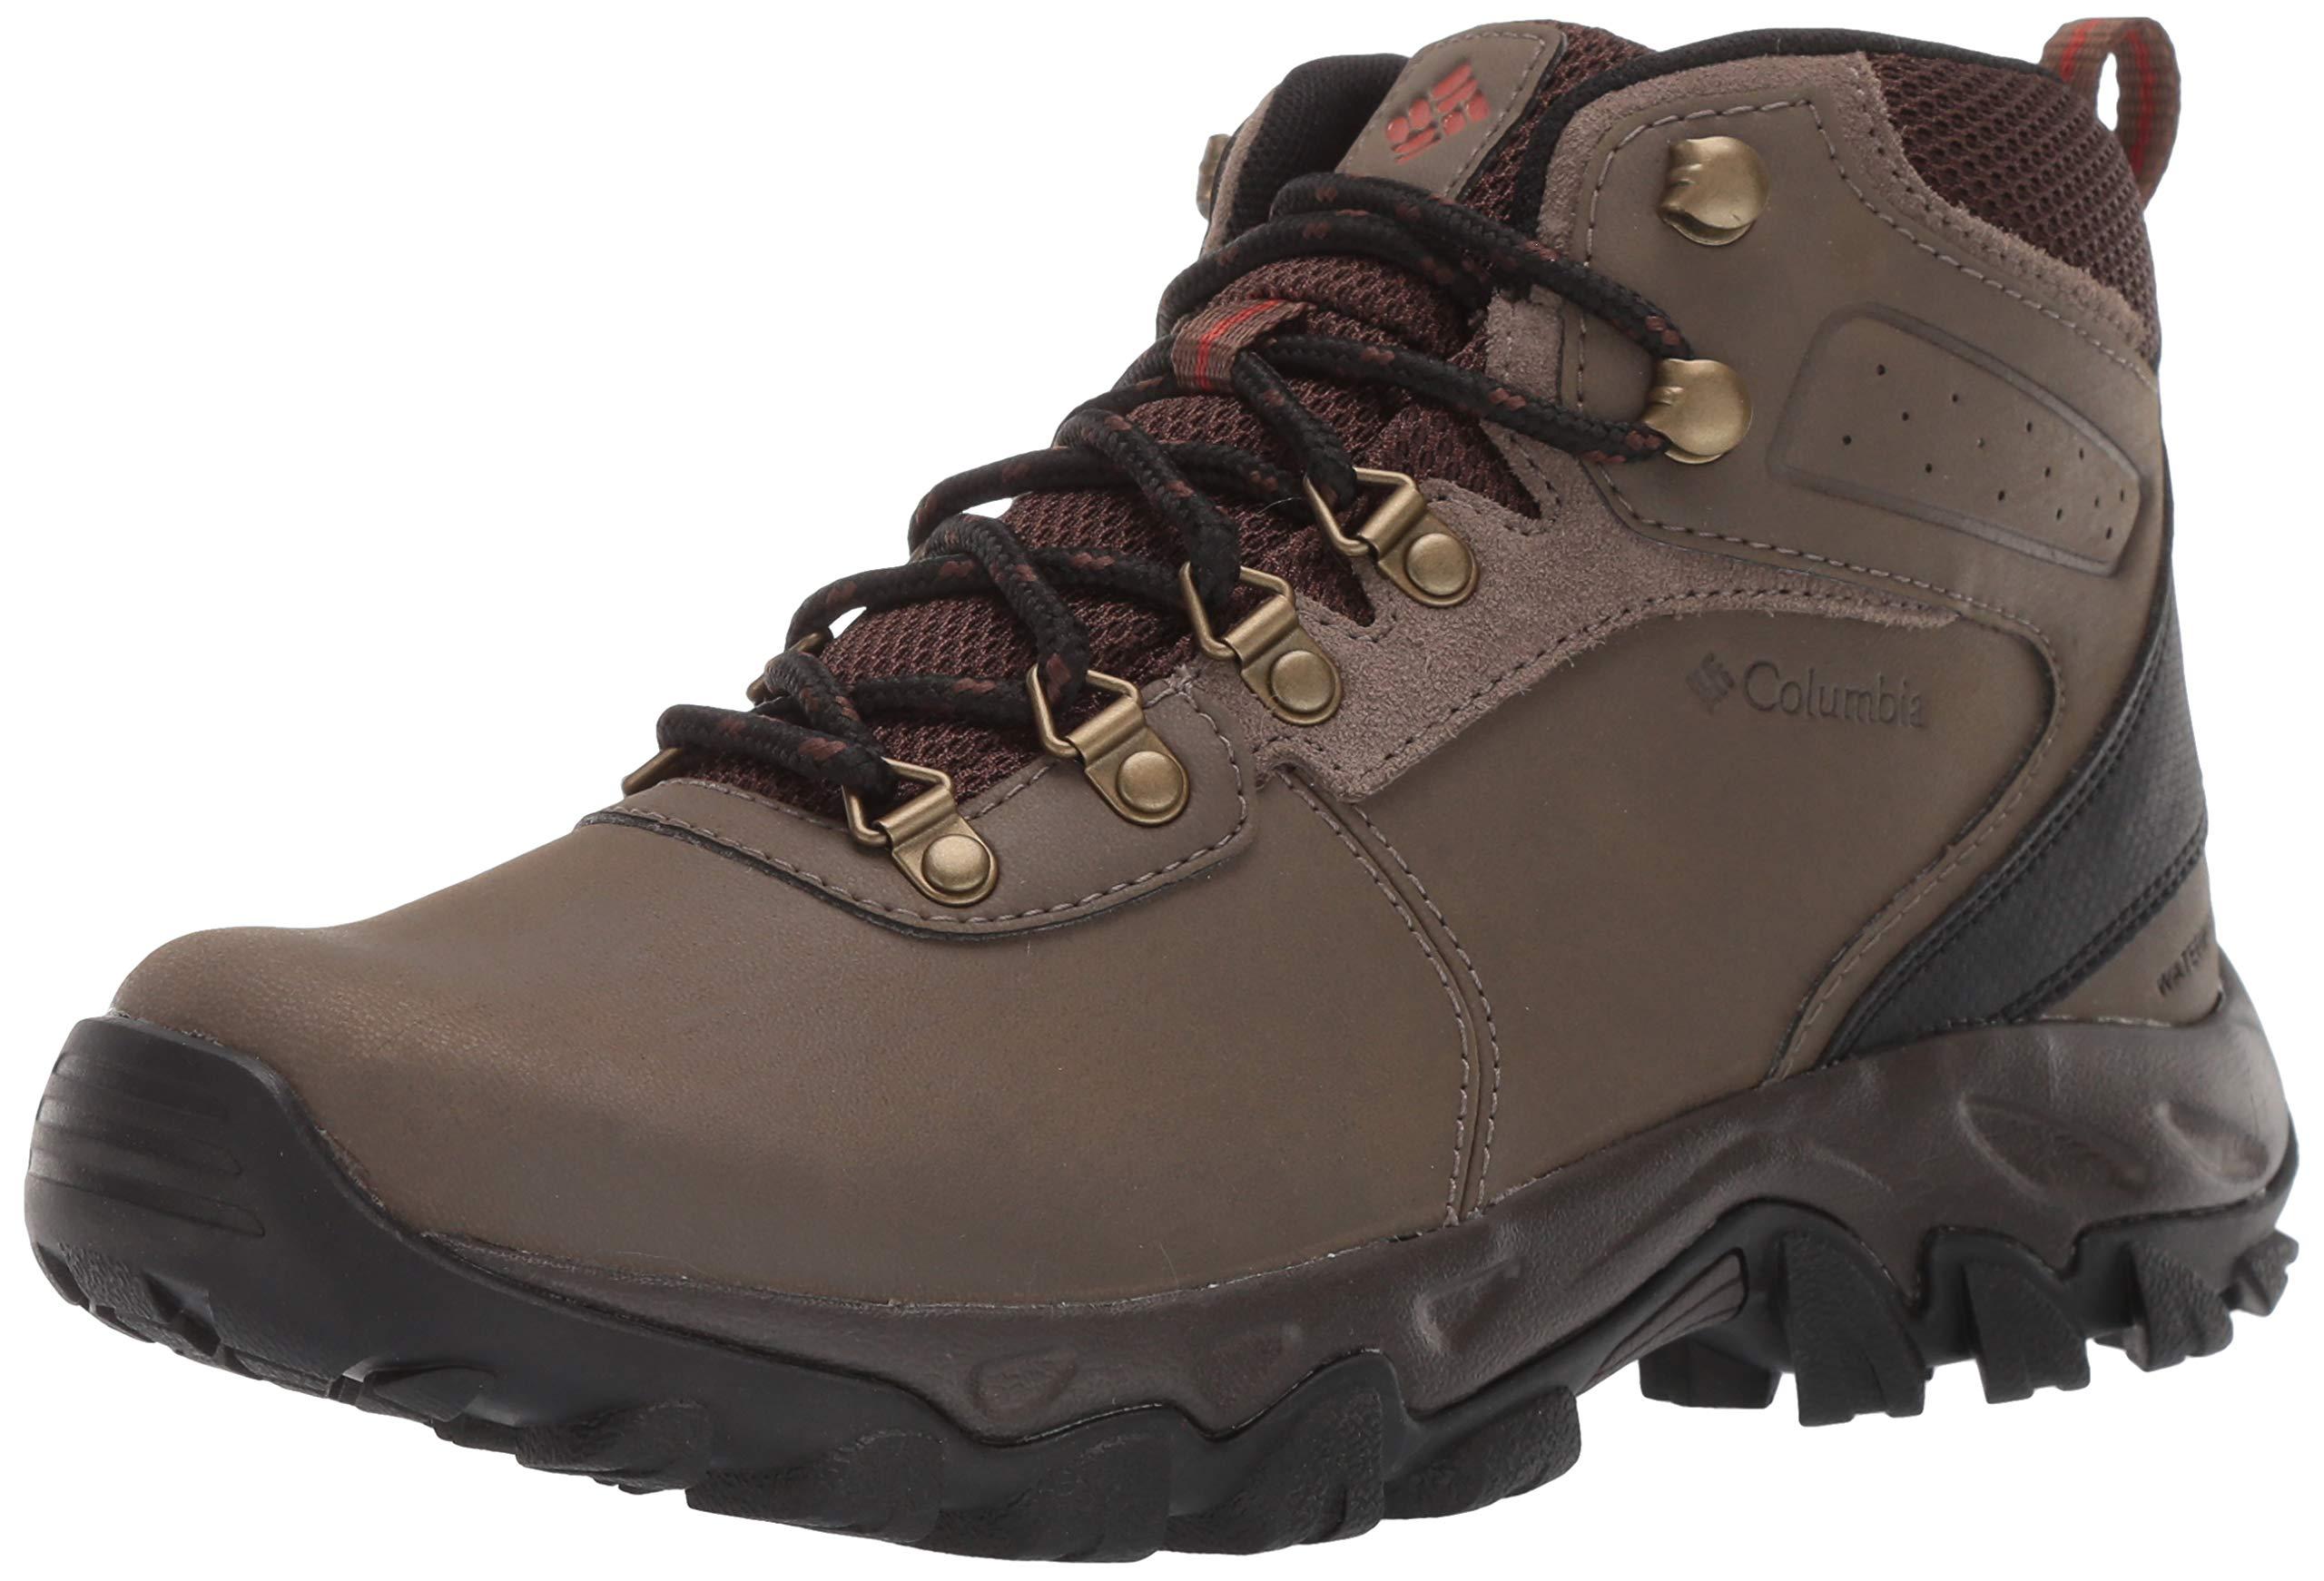 Columbia Men's Newton Ridge Plus II Waterproof Hiking Shoe, Mud, Sanguine, 7 D US